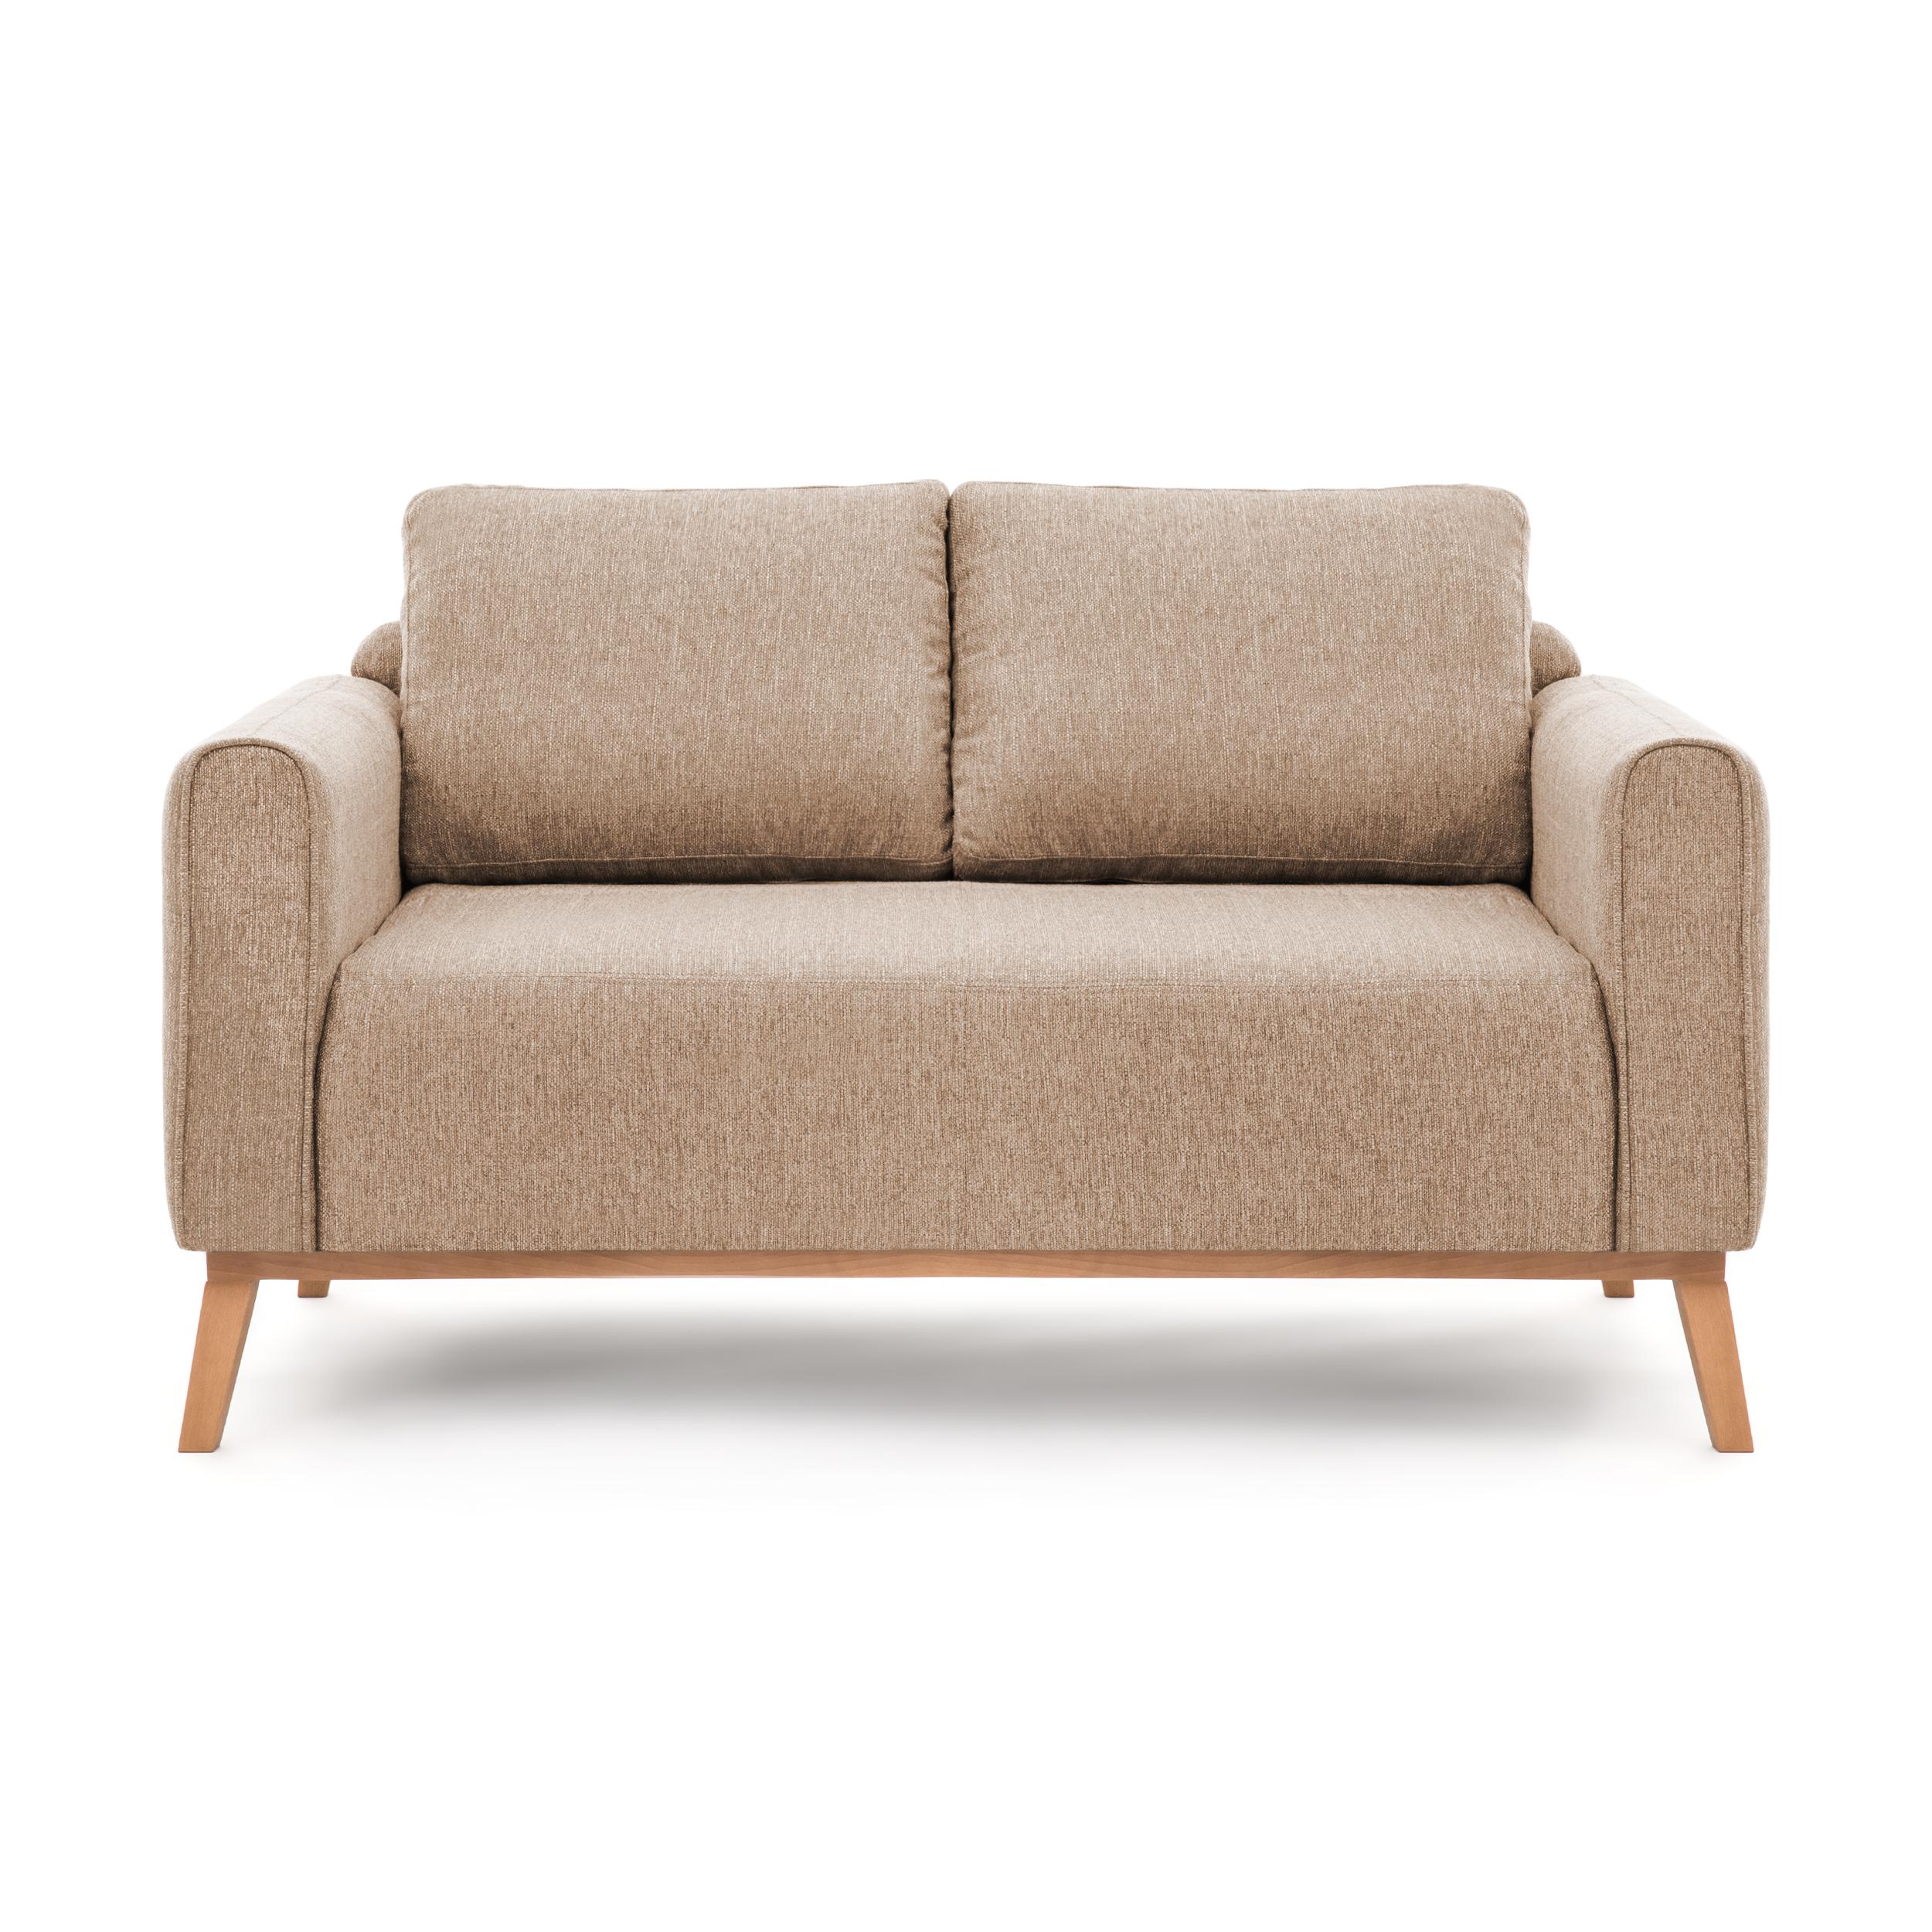 Canapea Fixa 2 locuri Milton Sand